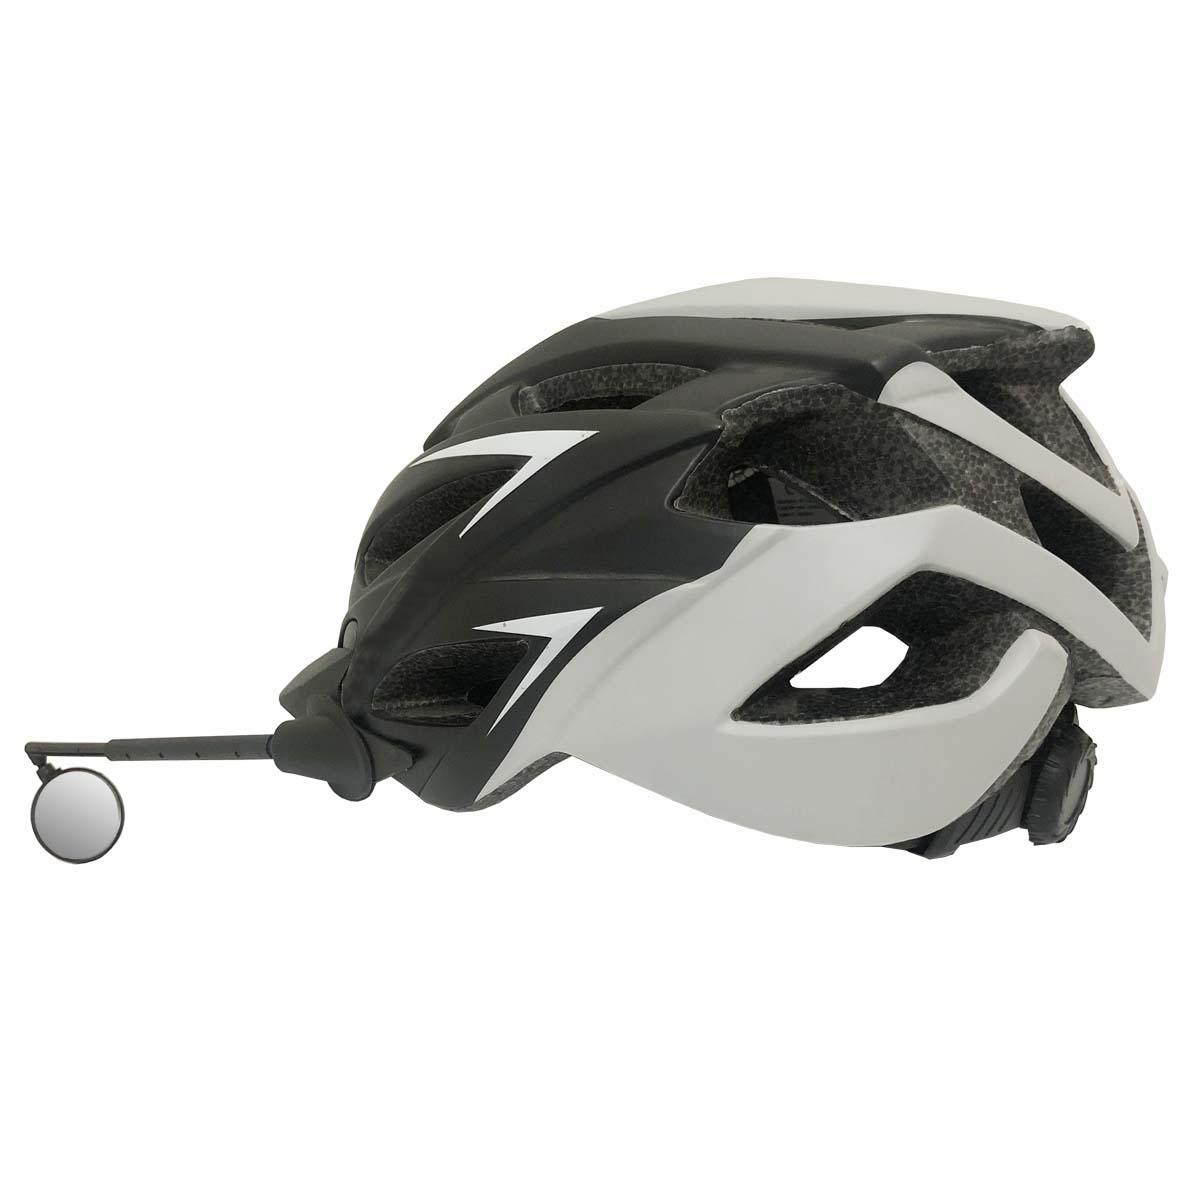 Espelho Retrovisor Capacete Bike Elleven